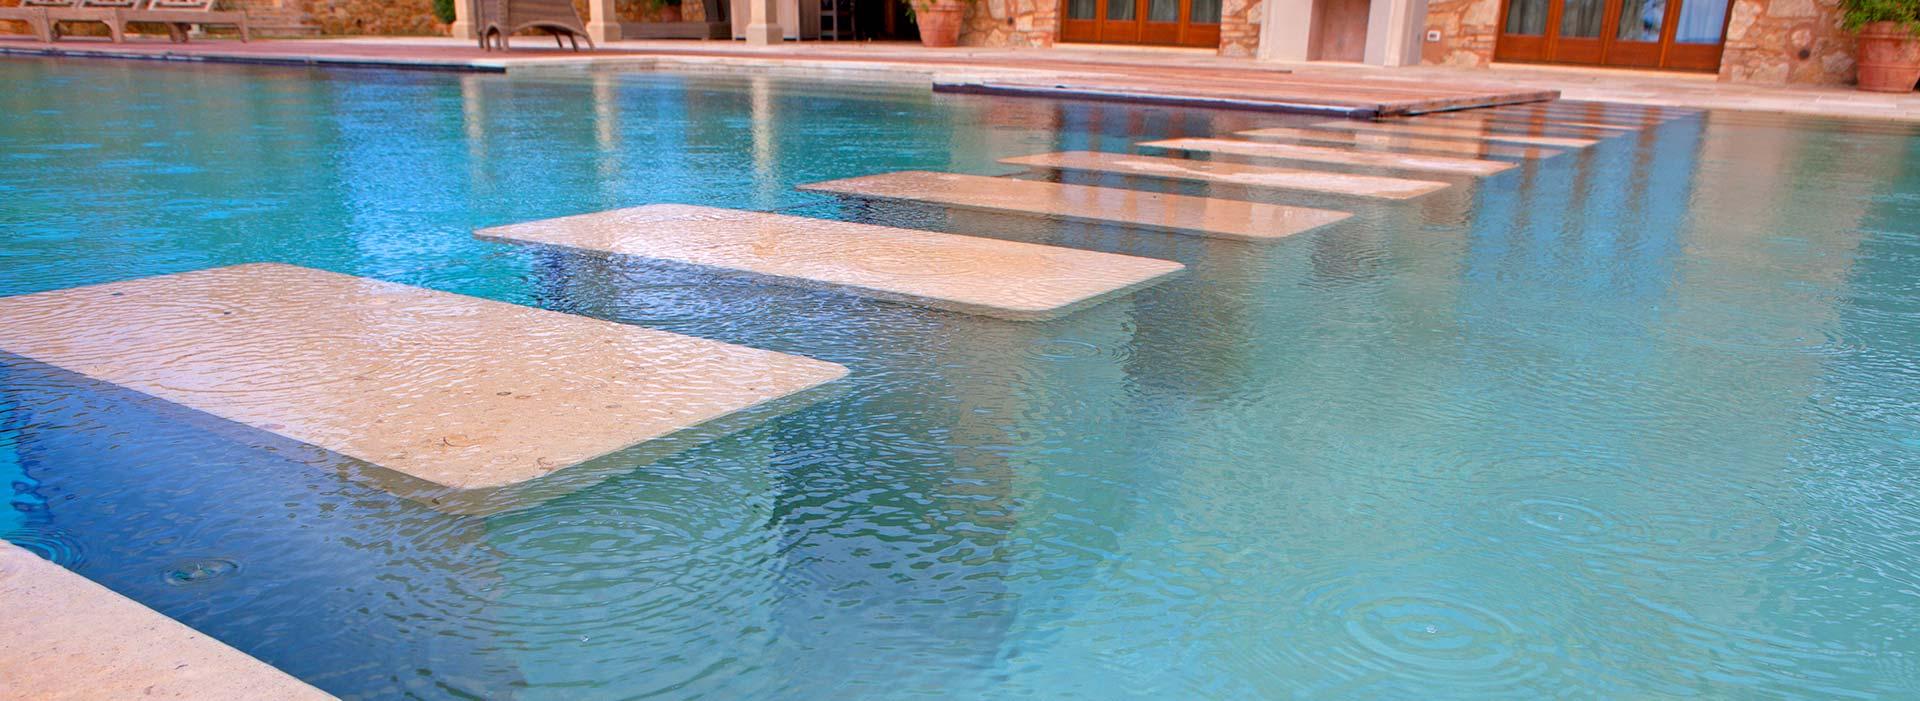 slide-piscine-venezia-1